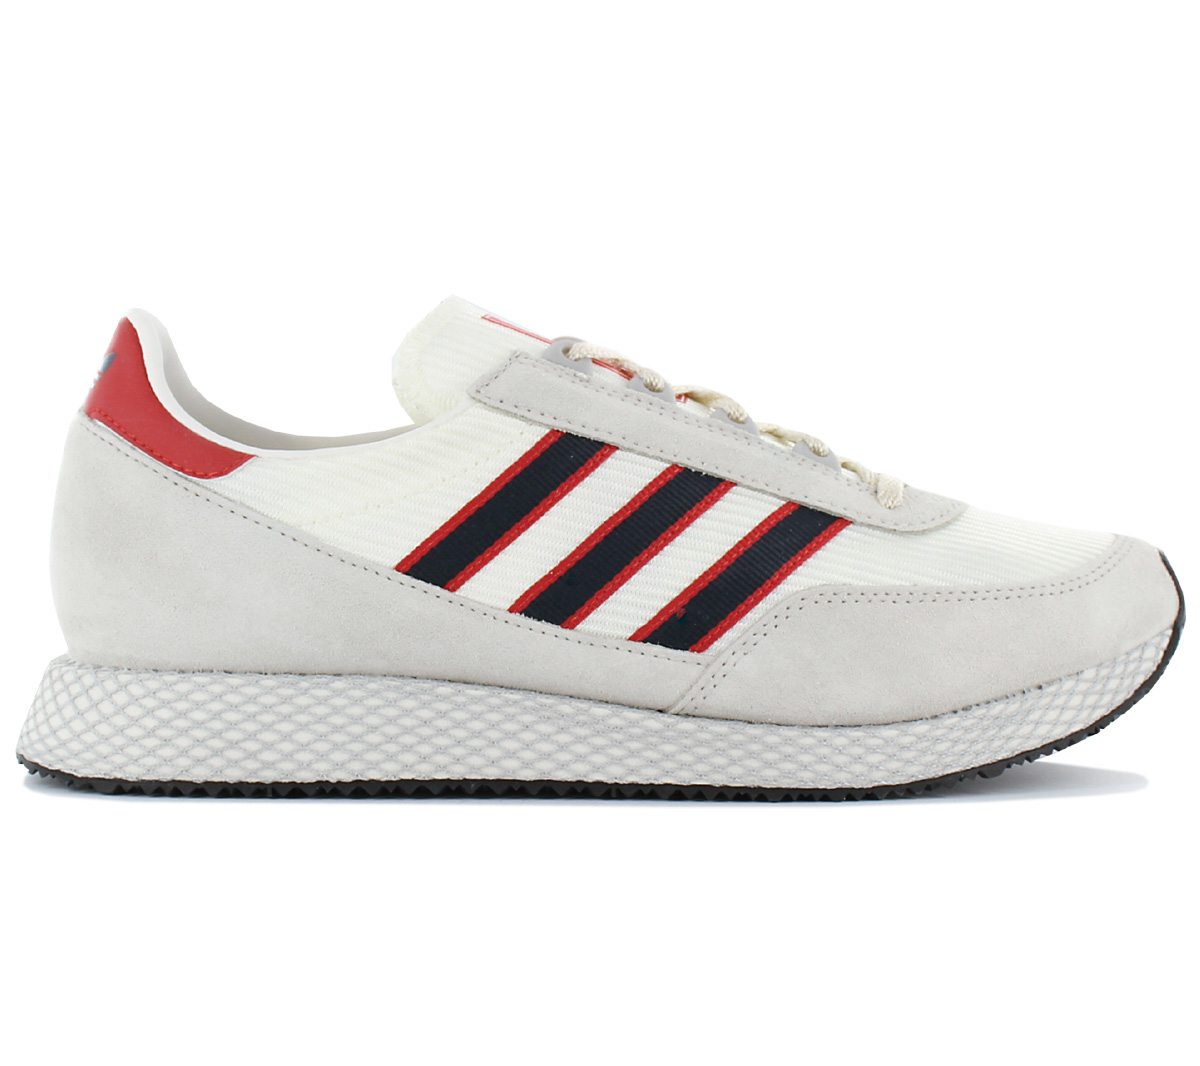 Details about Adidas Originals Glenbuck Special Spzl Men's Sneaker Retro Shoes DA8758 New